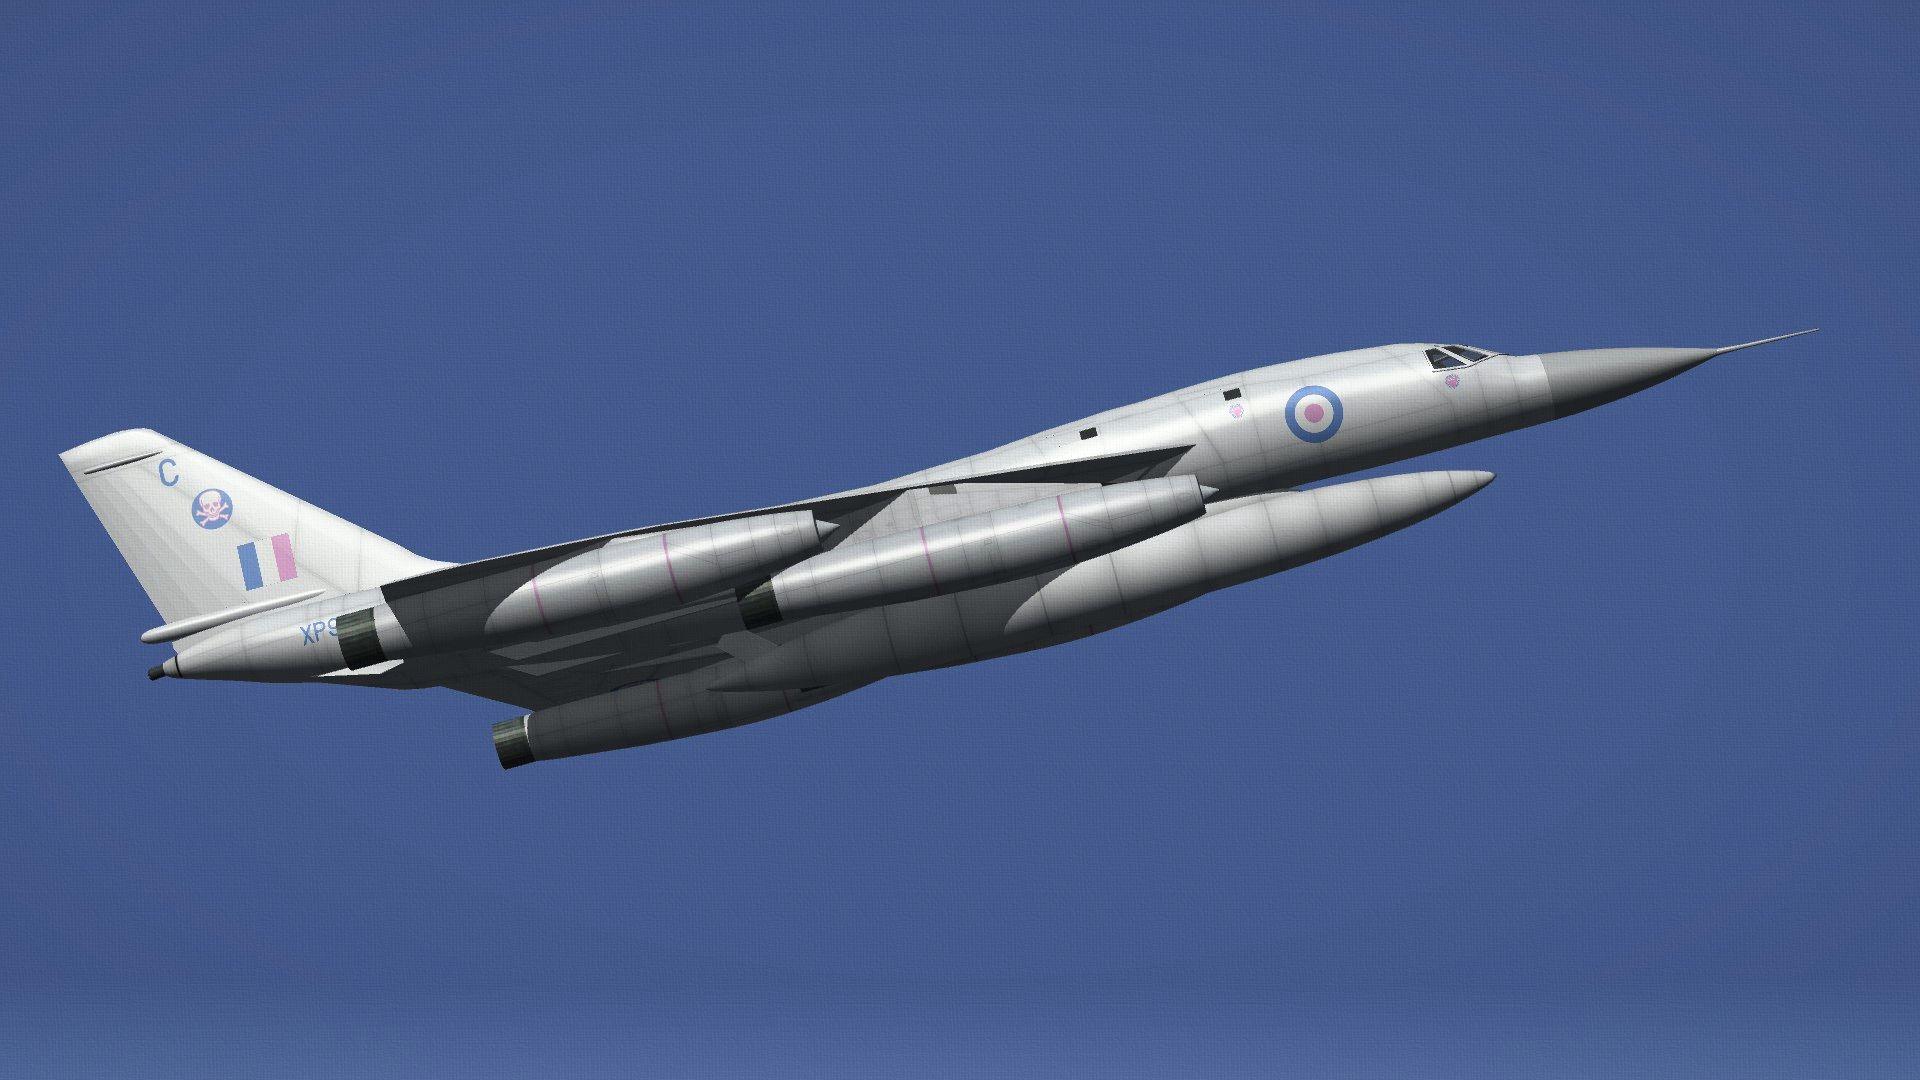 RAF%20HUSTLER%20B1.05_zpsnqgfsmdy.jpg